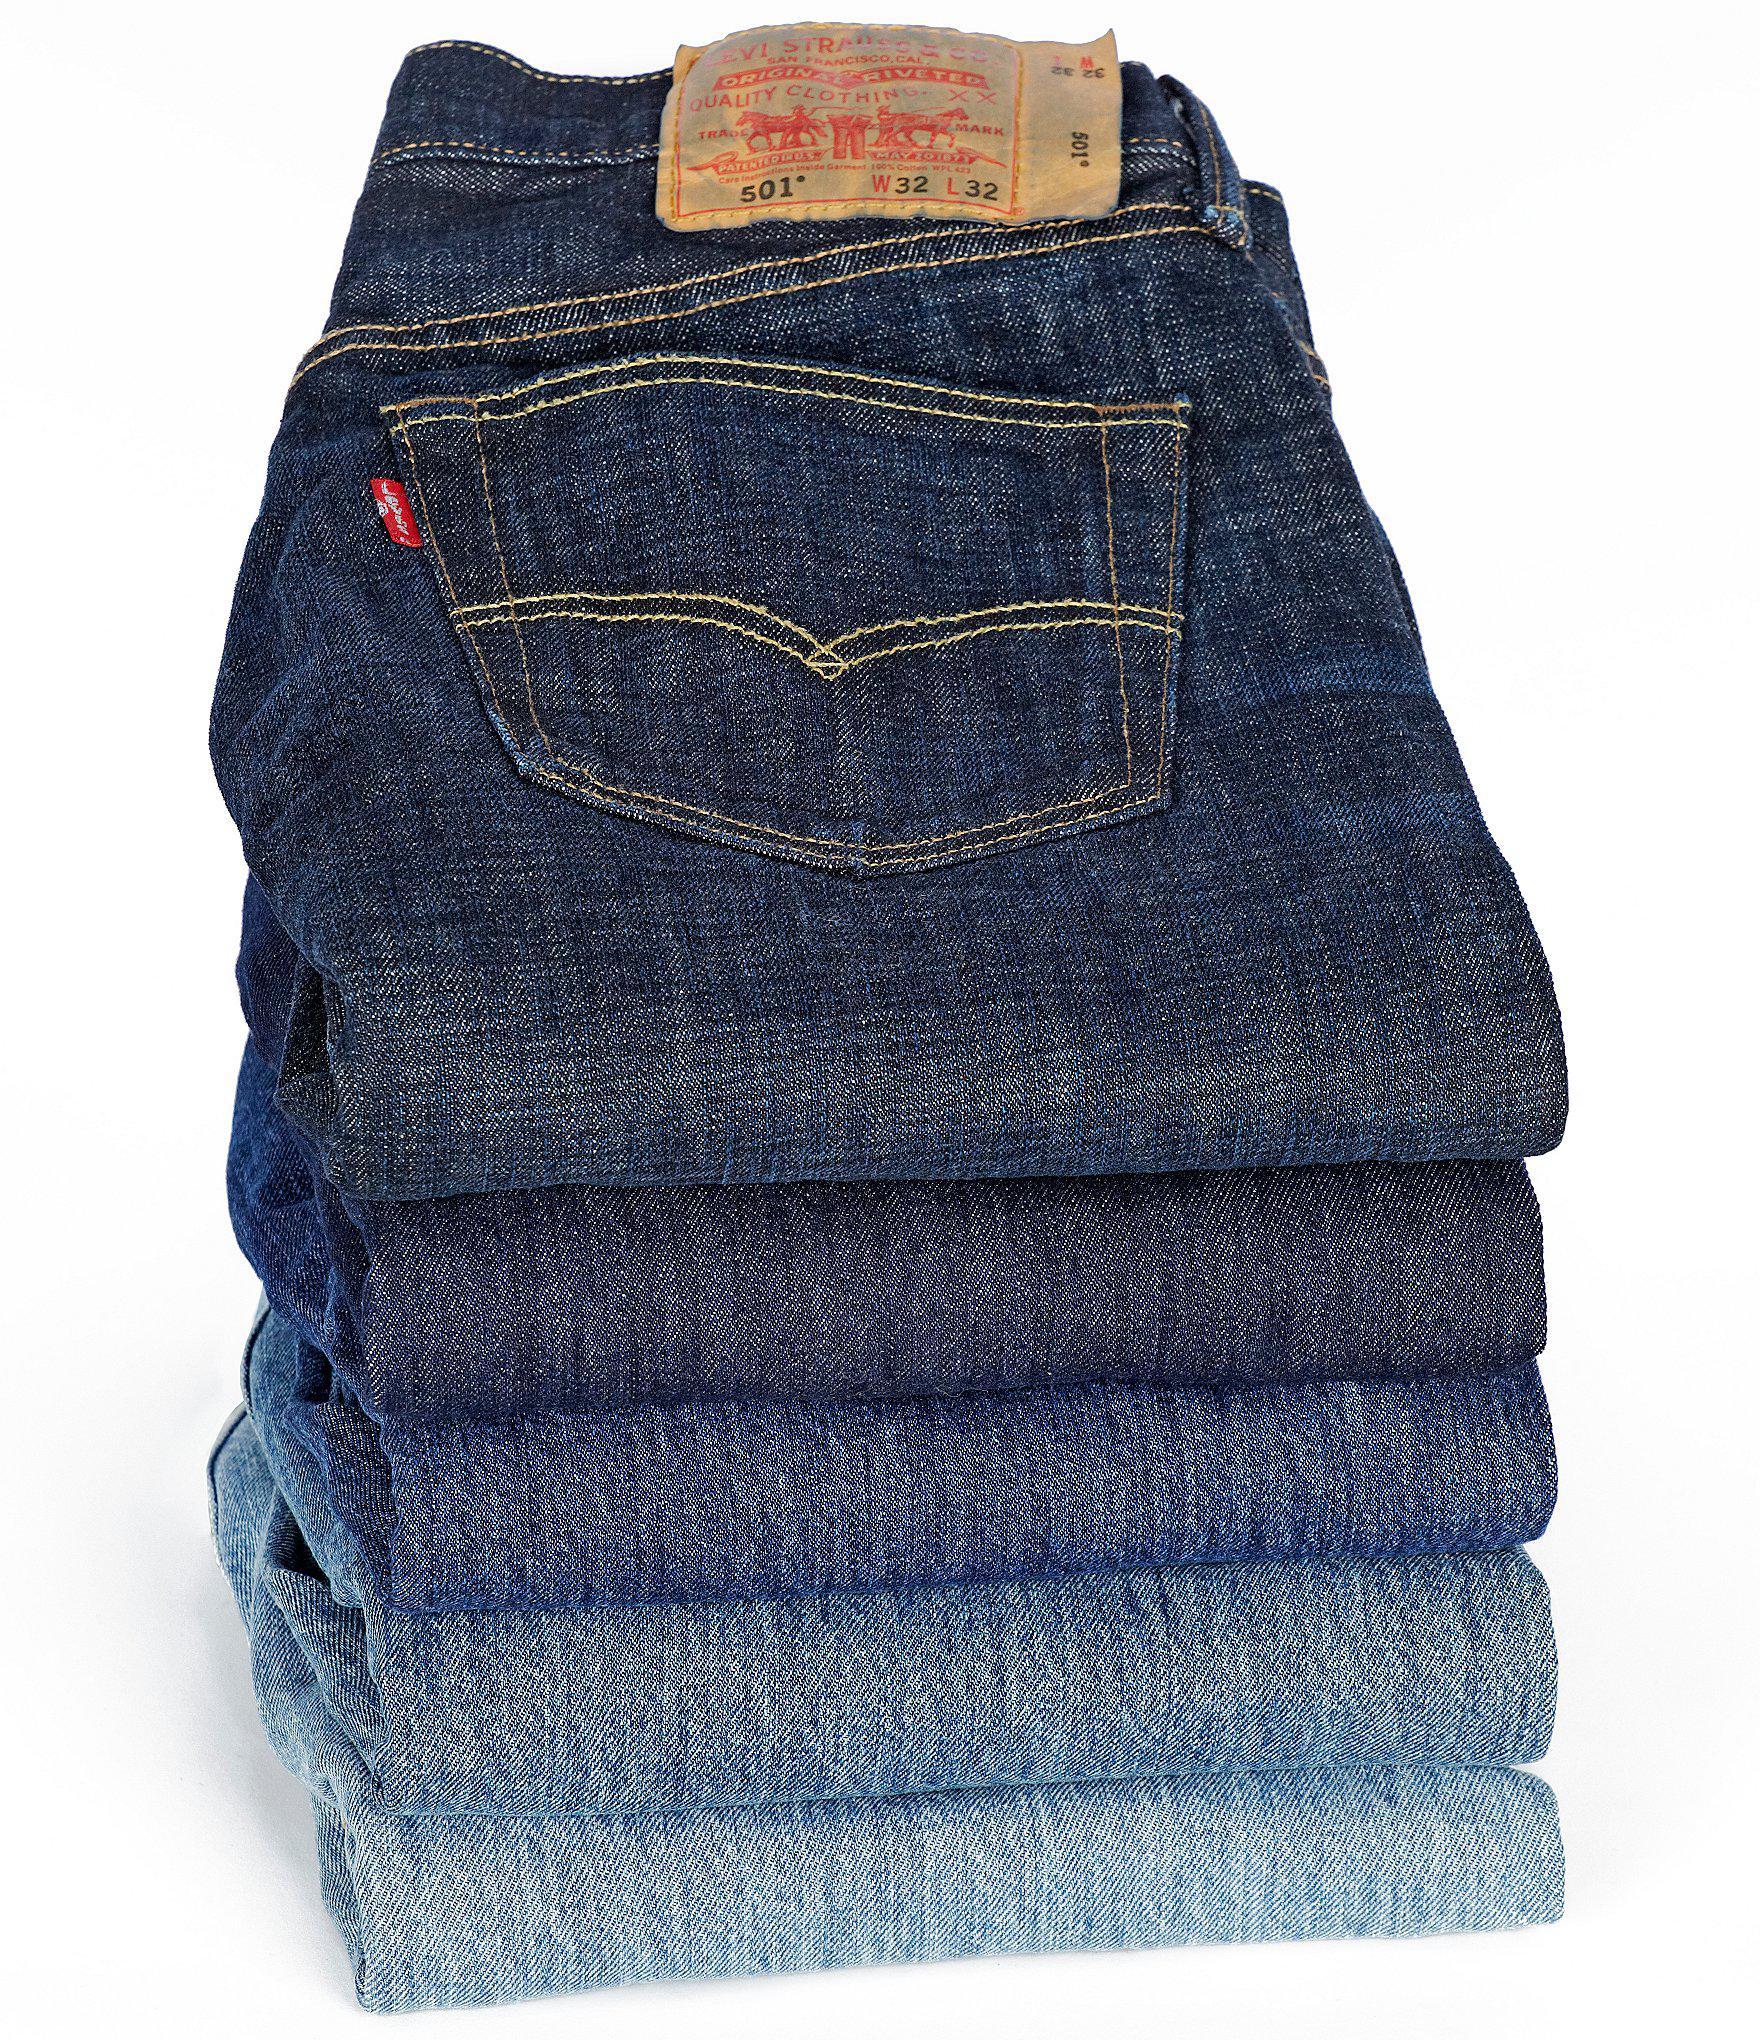 Levi's Denim Levi ́s® 501® Original Fit Jeans in Light ...